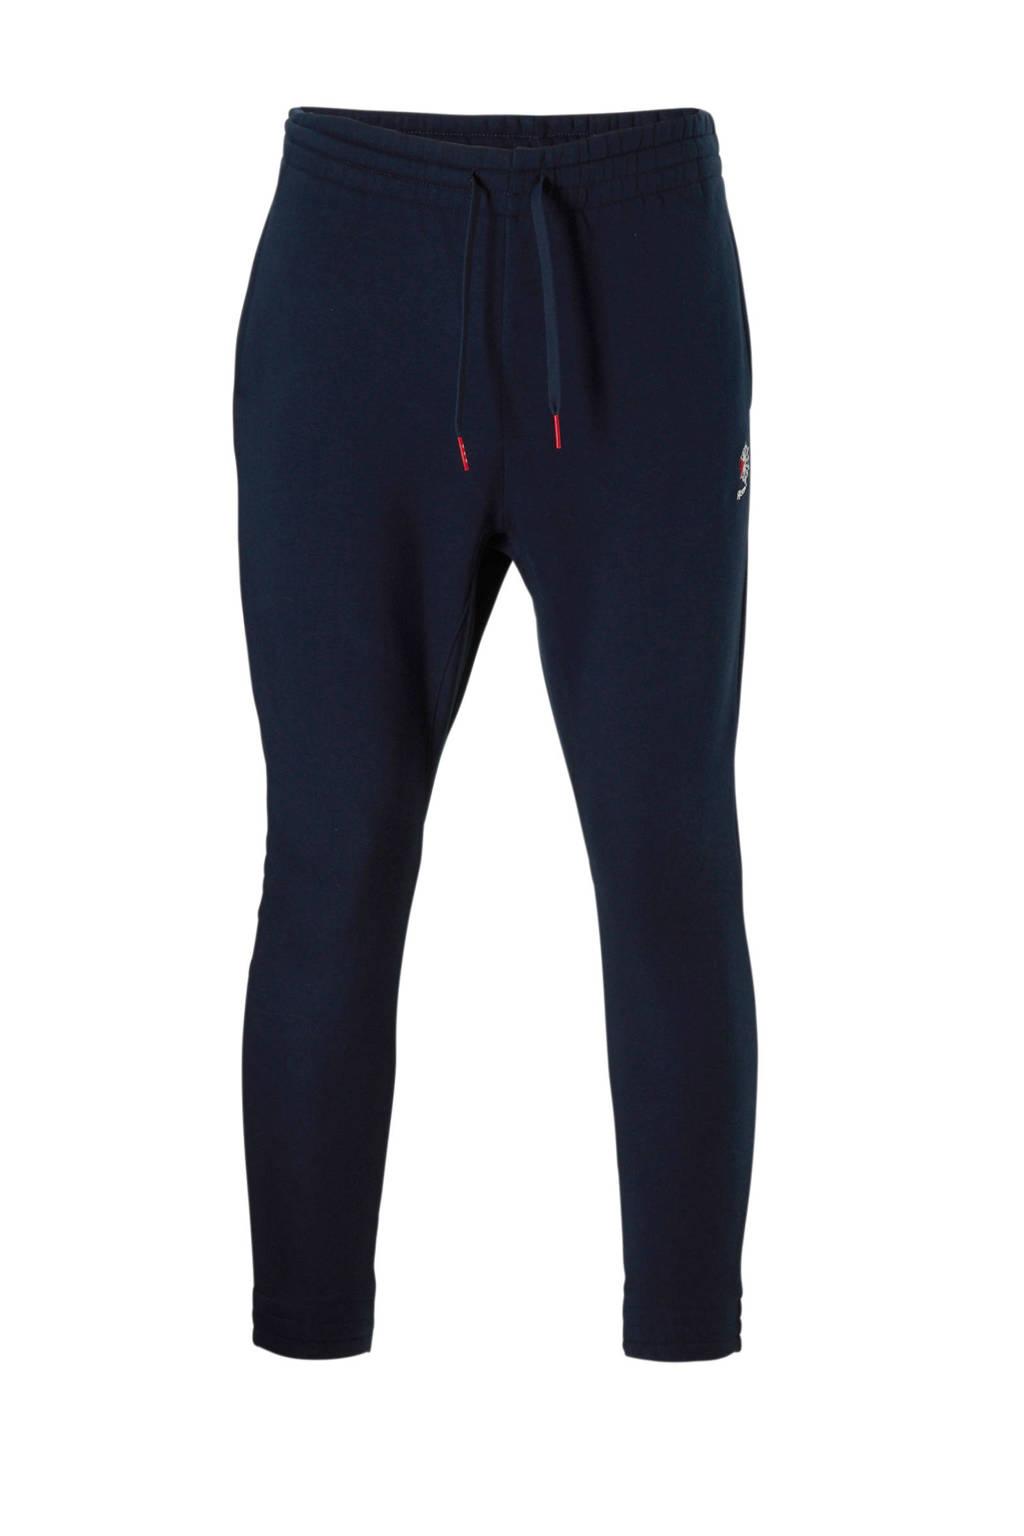 Reebok Classics joggingbroek donkerblauw, Donkerblauw